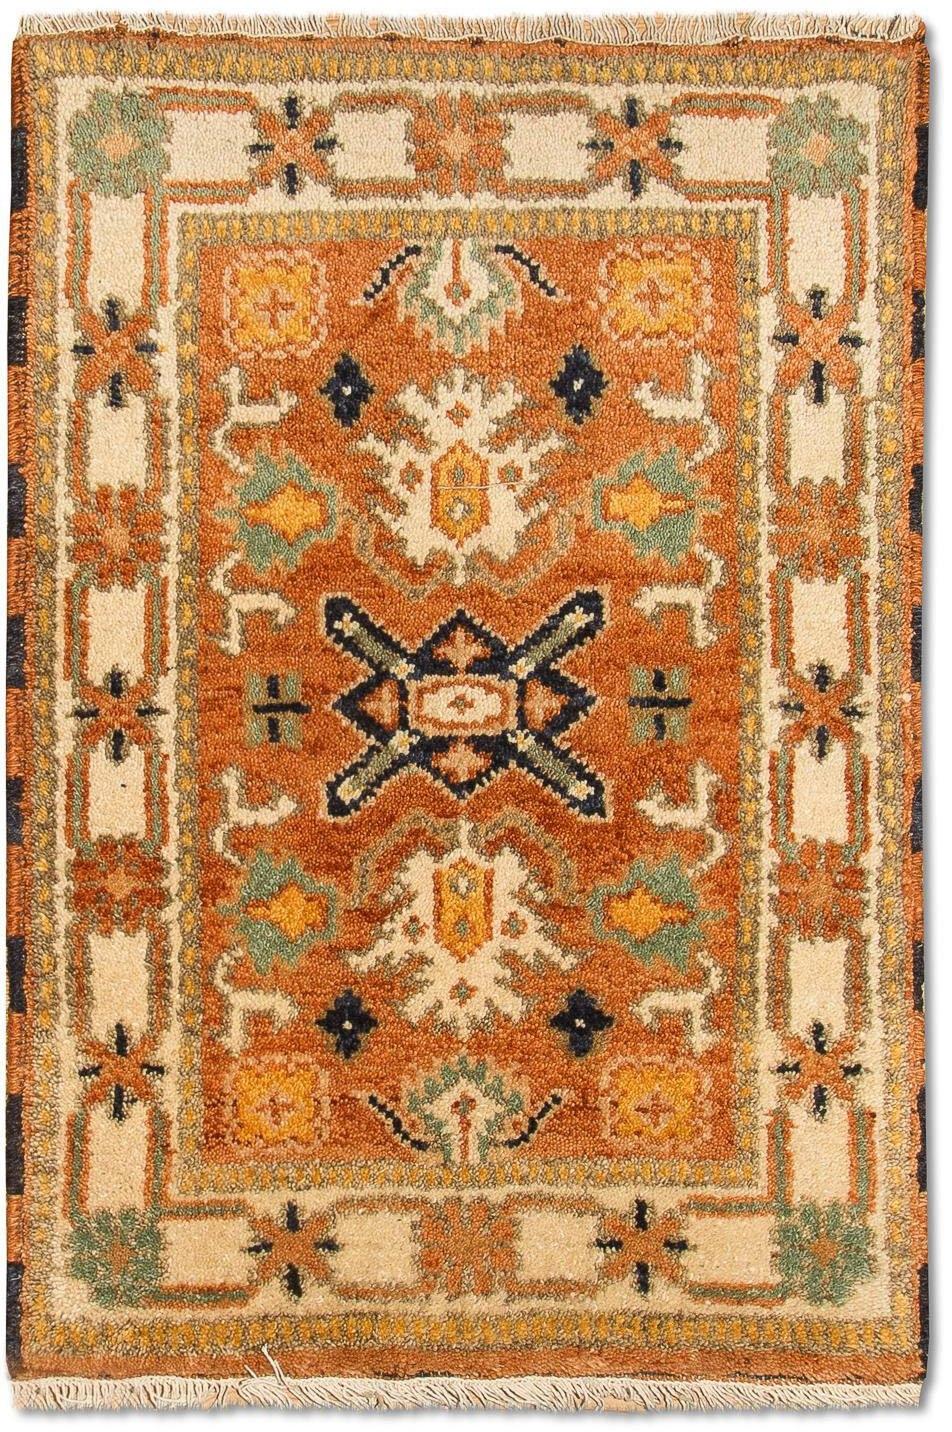 morgenland wollen kleed Kazak Teppich handgeknüpft orange goedkoop op otto.nl kopen